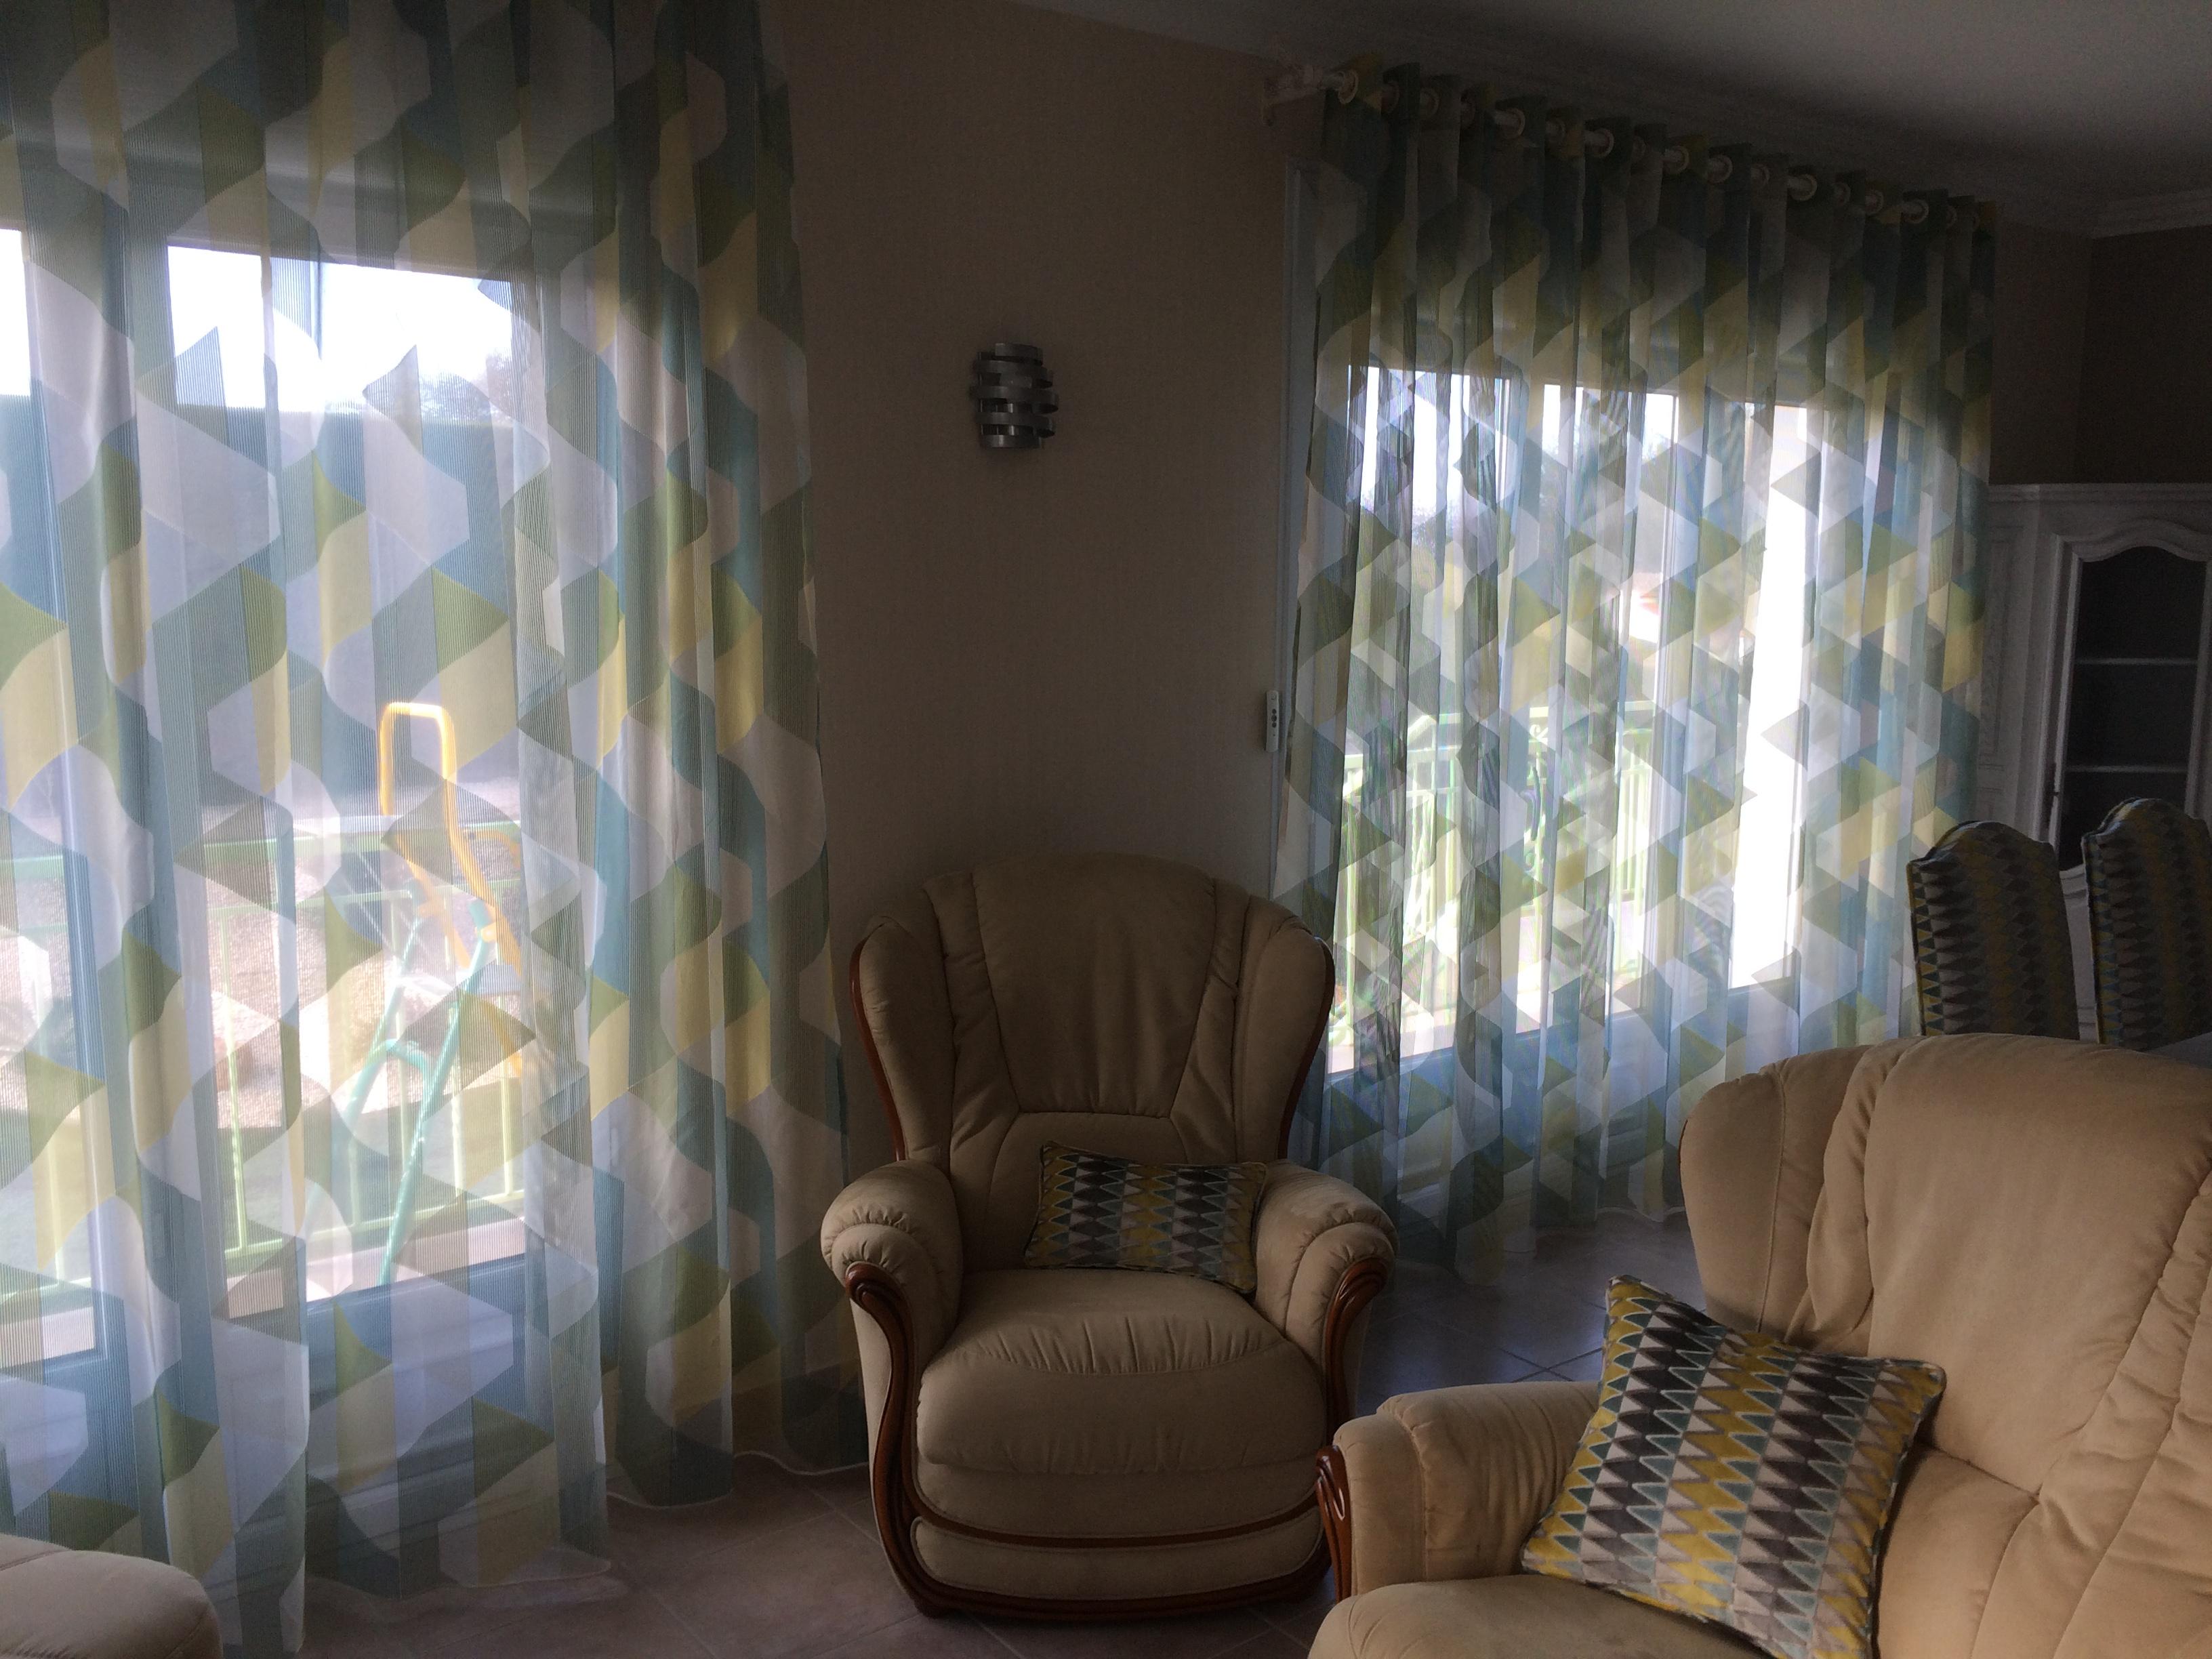 cr ation rideau hossegor orthez mont de marsan sarl hourquet et fils. Black Bedroom Furniture Sets. Home Design Ideas